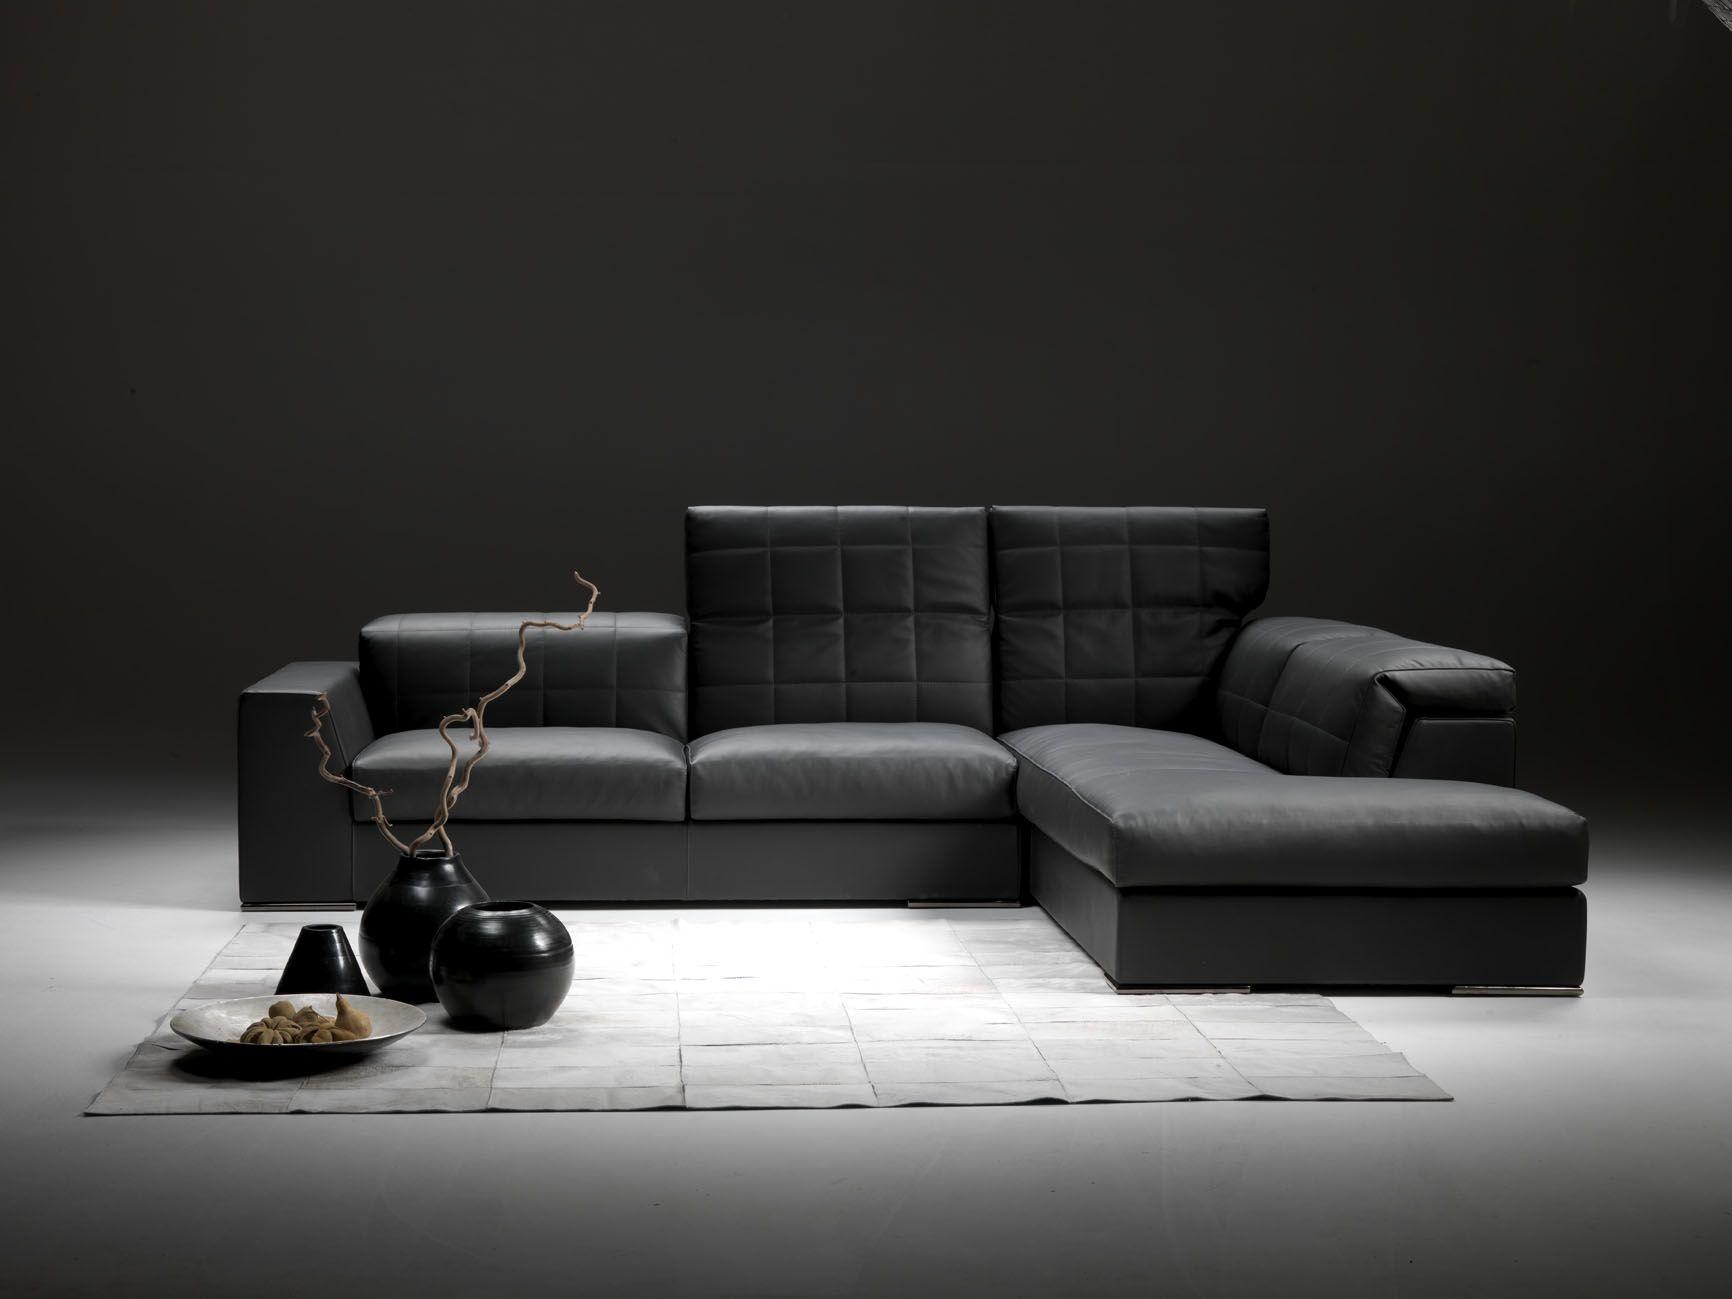 Eckcouch Modern corner sofa contemporary leather 4 seater zoe gyform